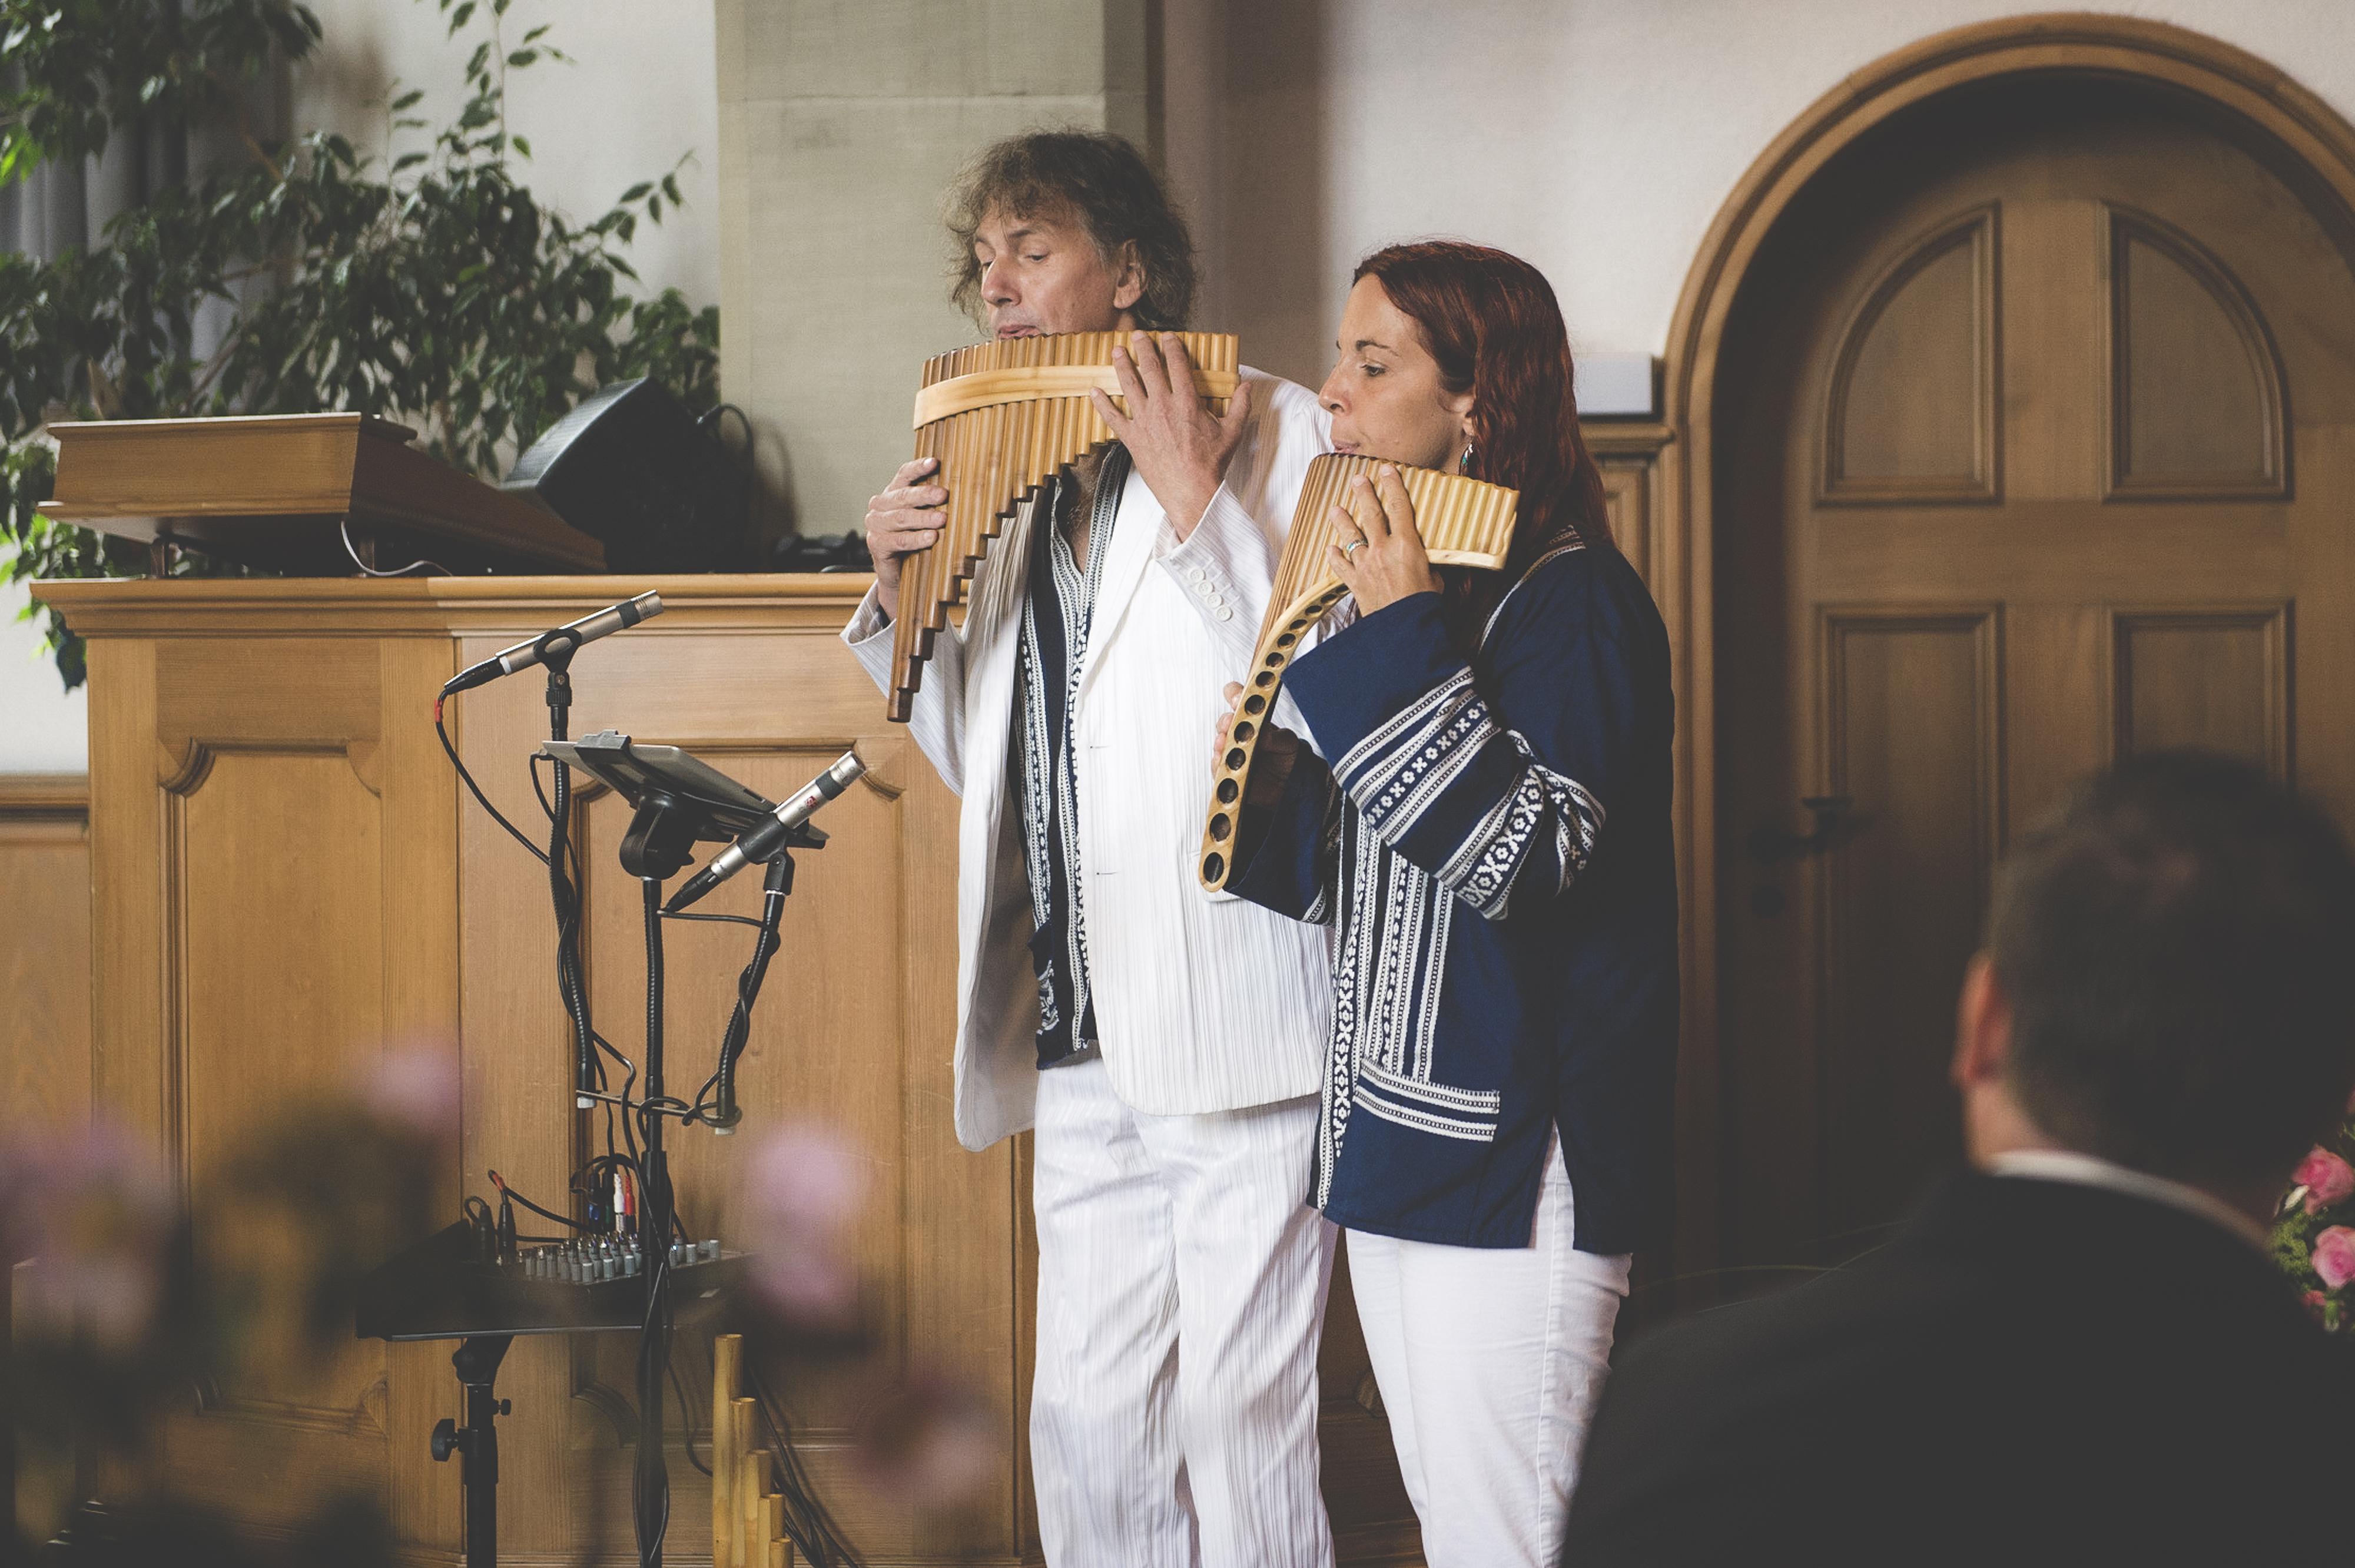 Panflötenduo, Musiker